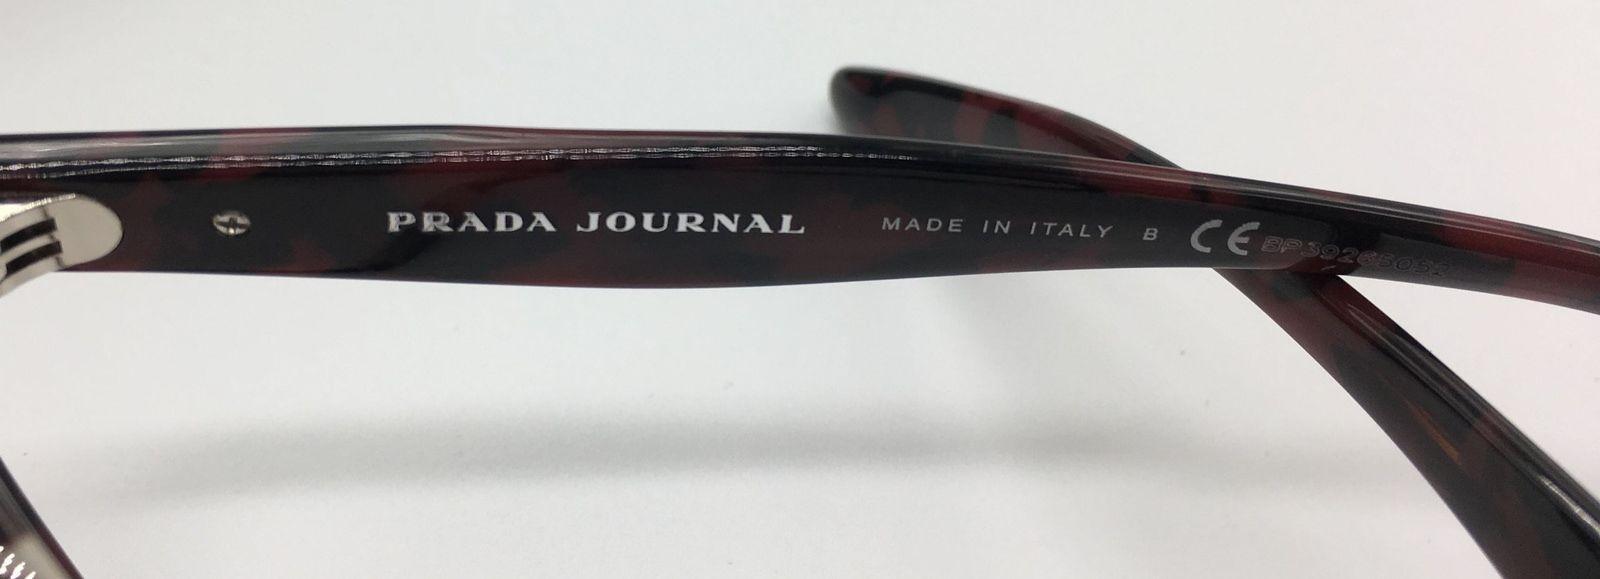 29fdb5c998f Made in Italy! Prada Journal VPR04T U6K-1O1 and 50 similar items